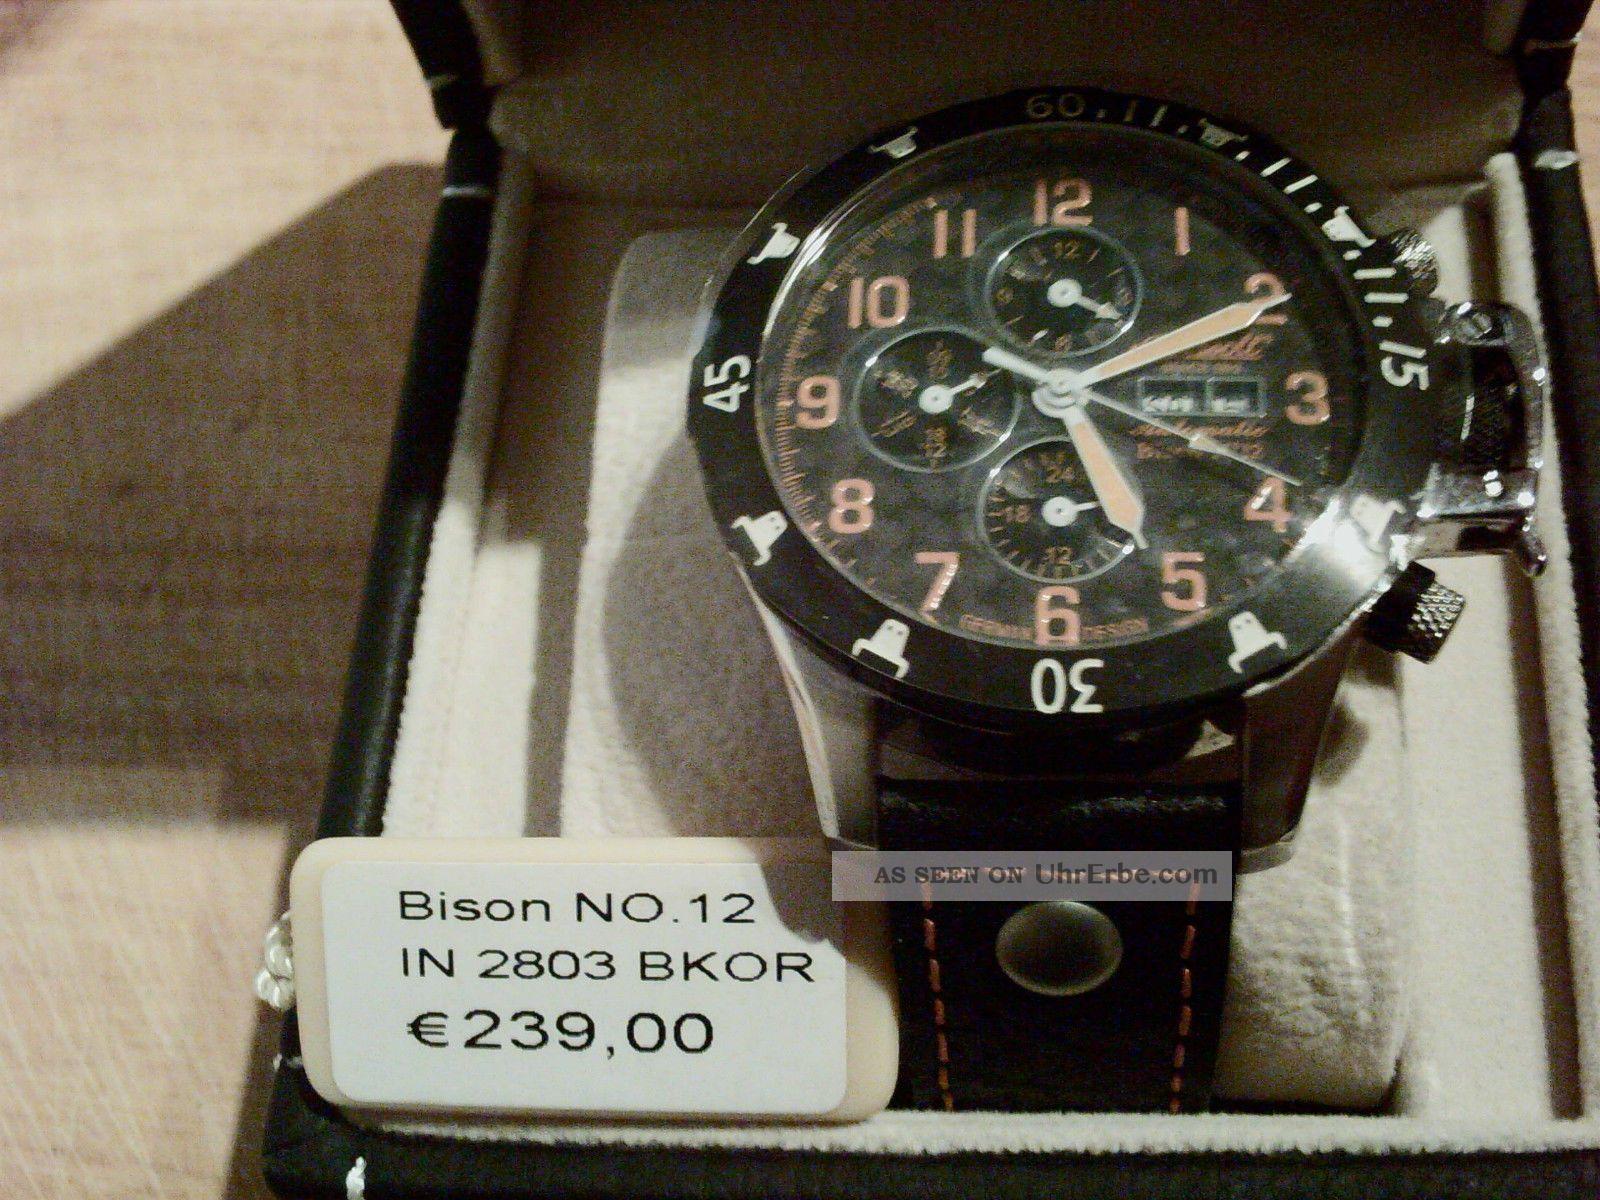 Ingersoll Bison No.  12 Herrenuhr 2803bkor Armbanduhren Bild